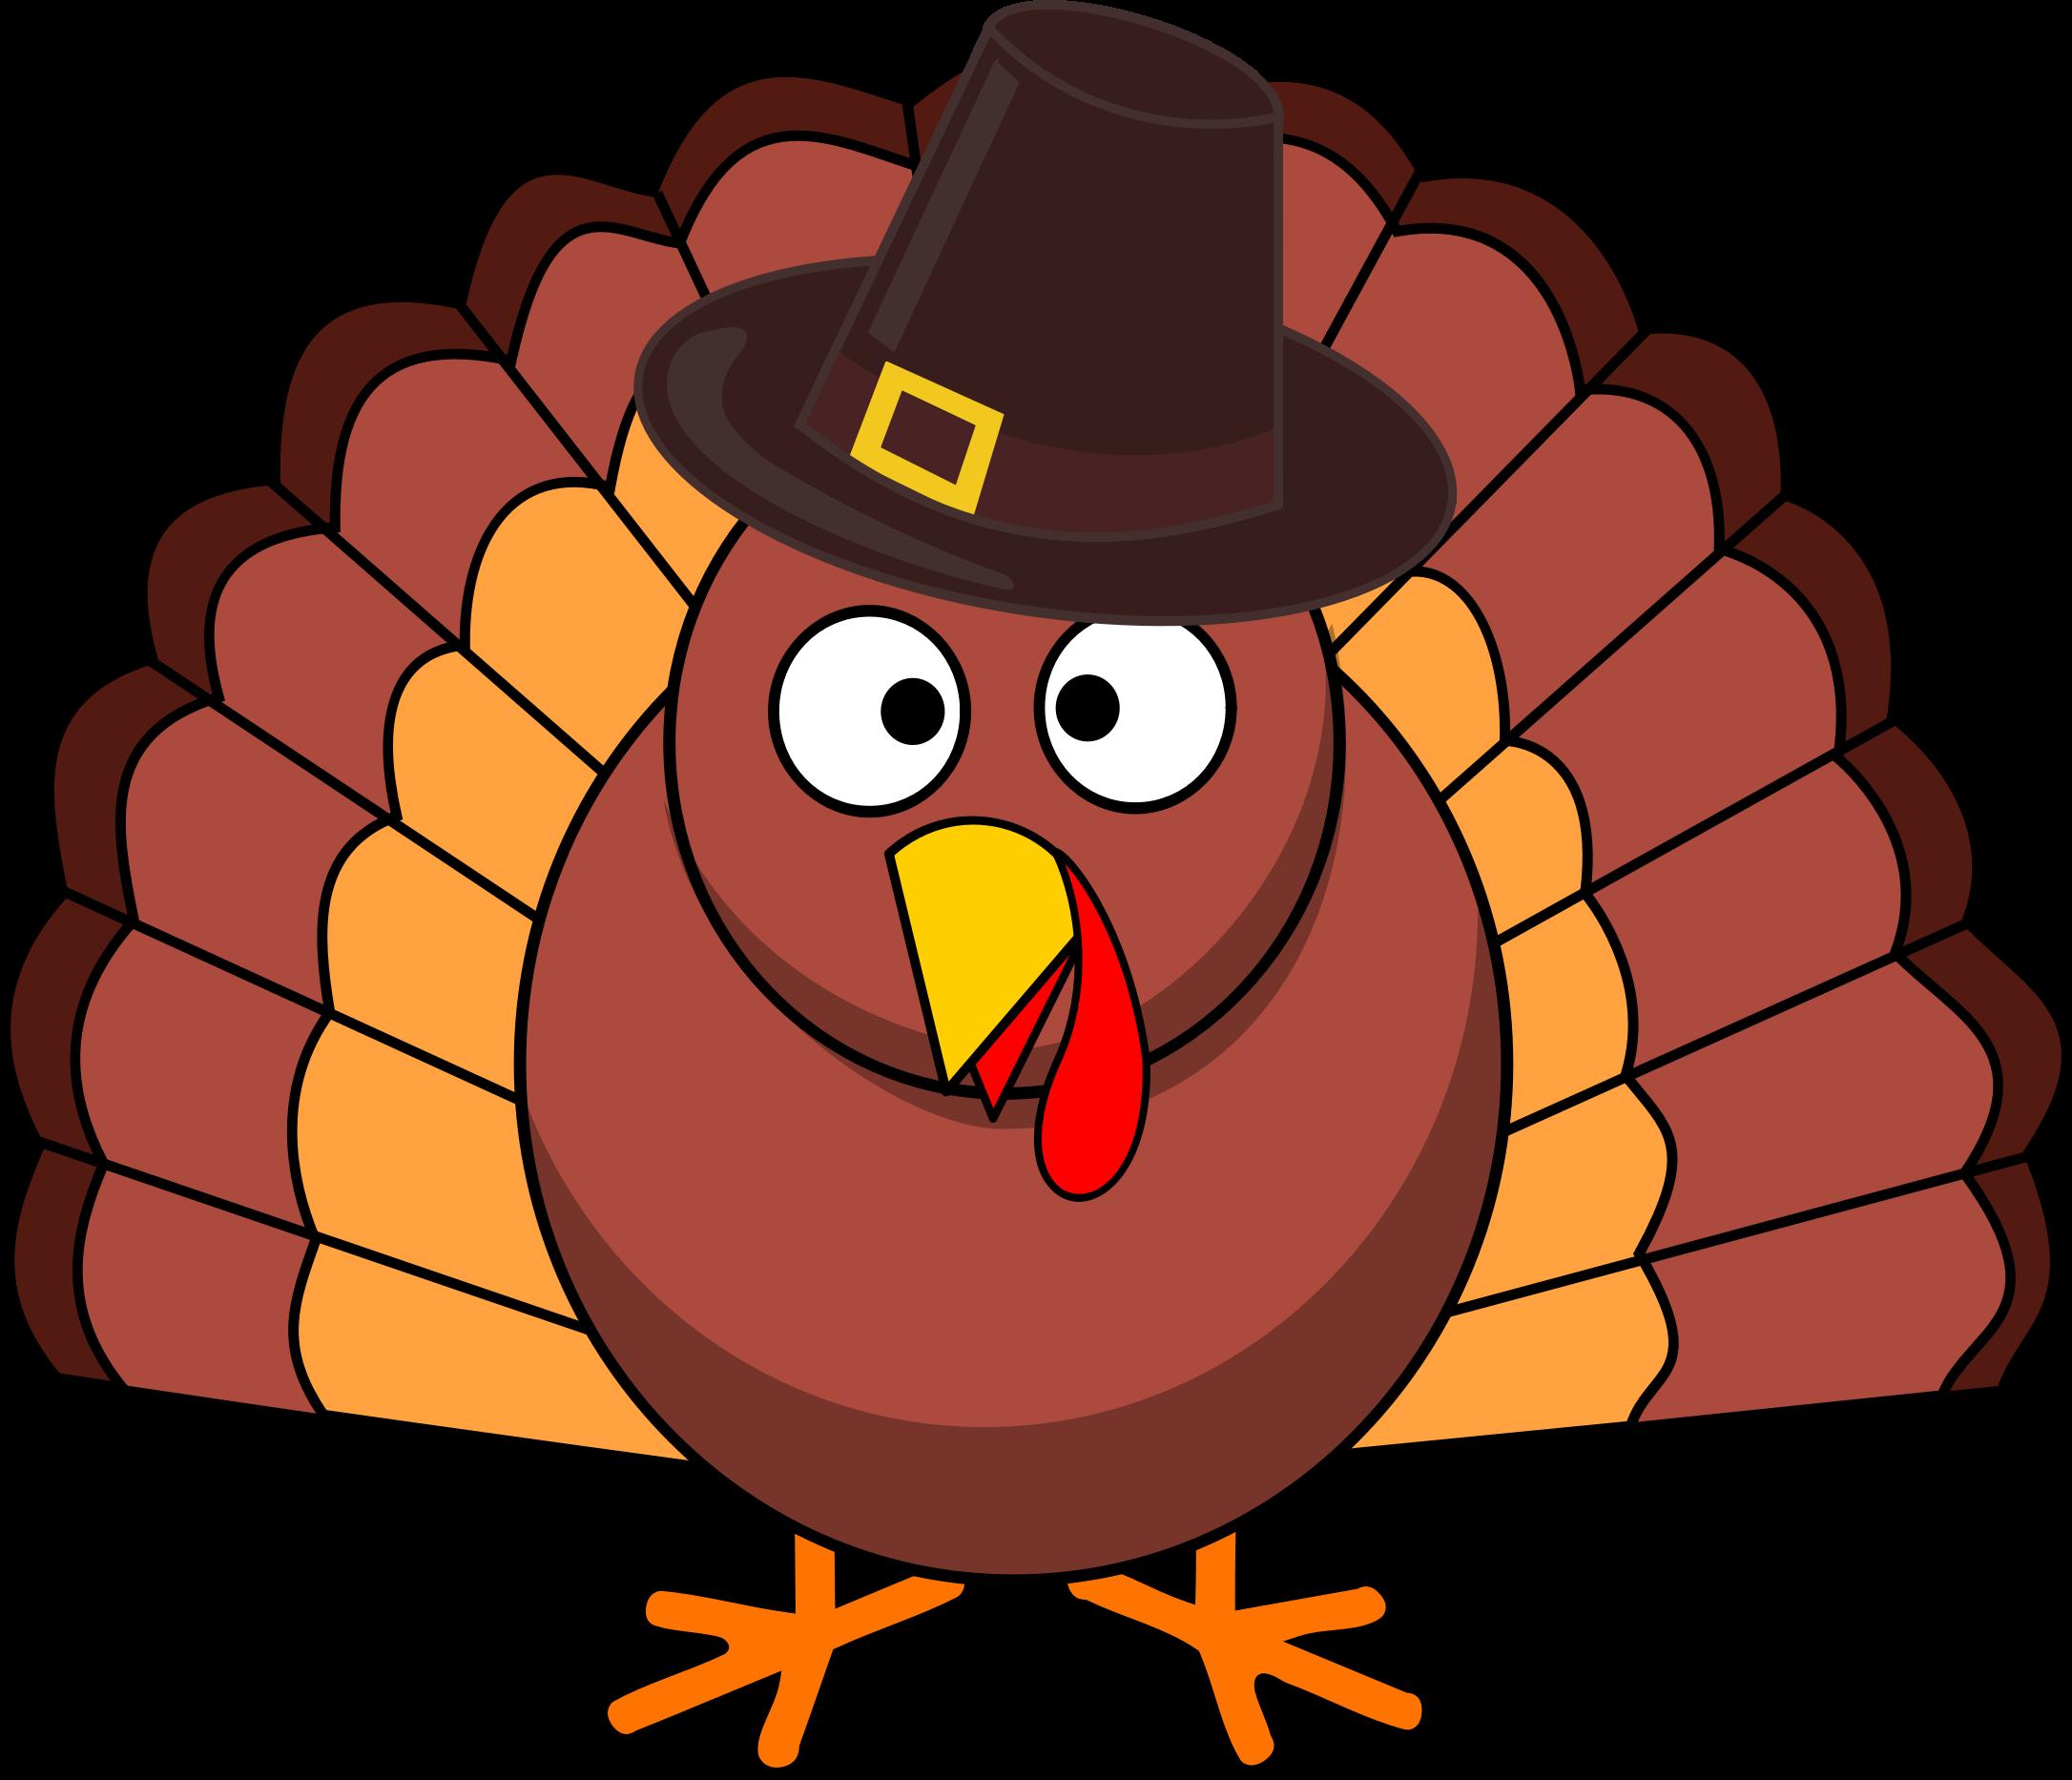 November clipart turkey beak, November turkey beak.